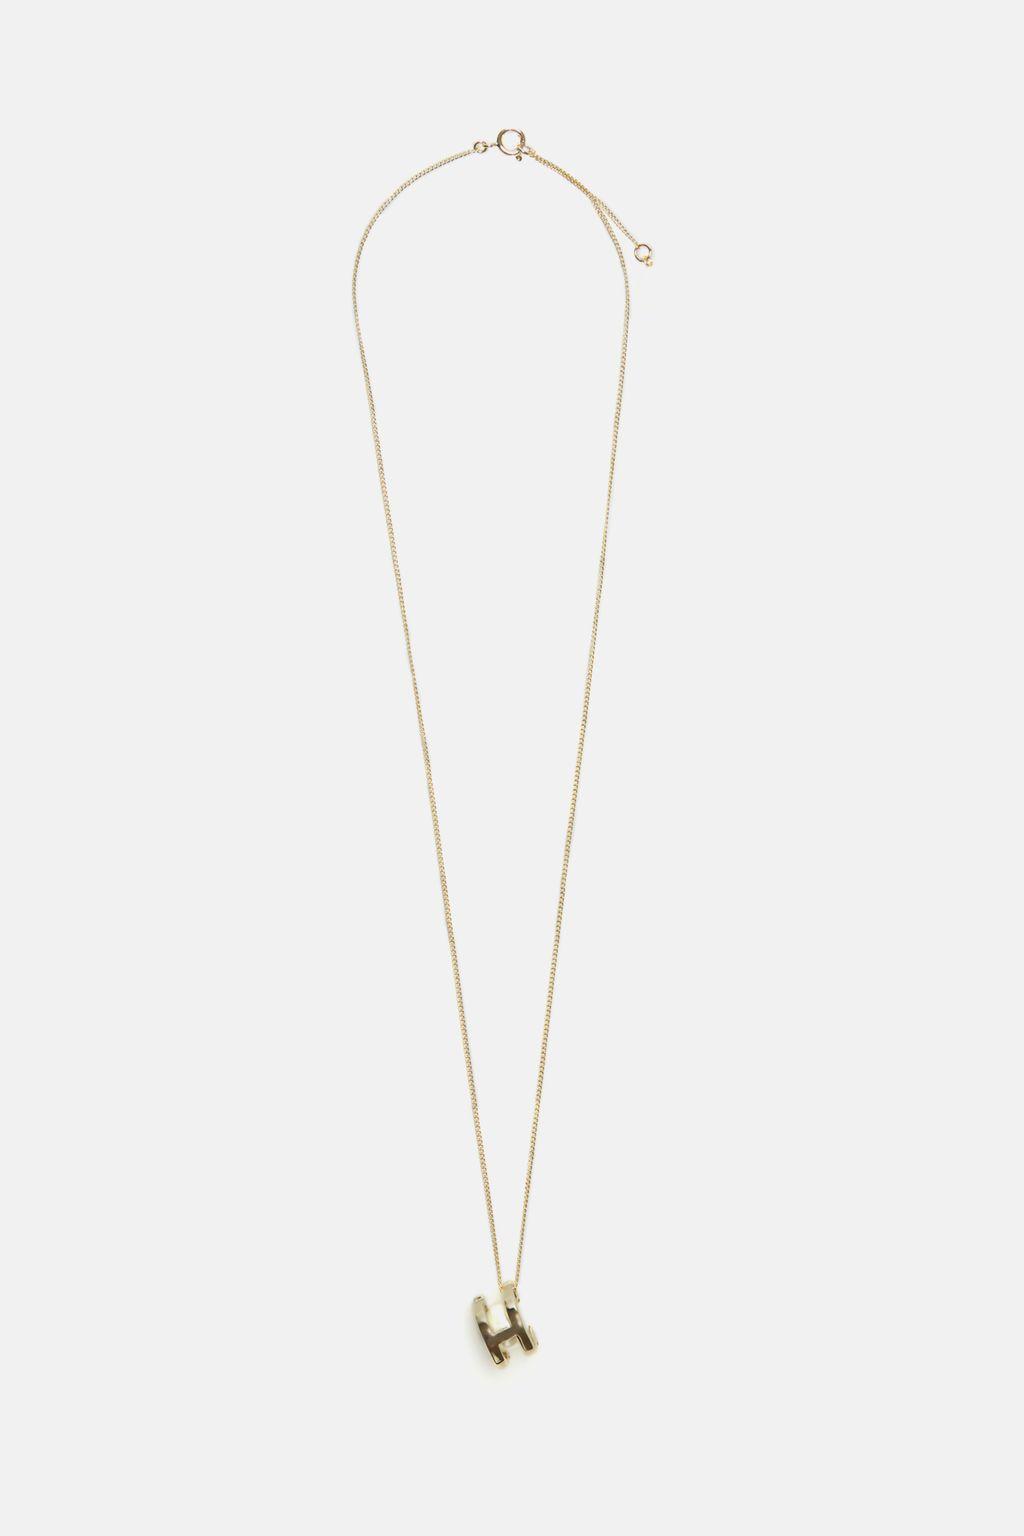 Insignia Pearl necklace